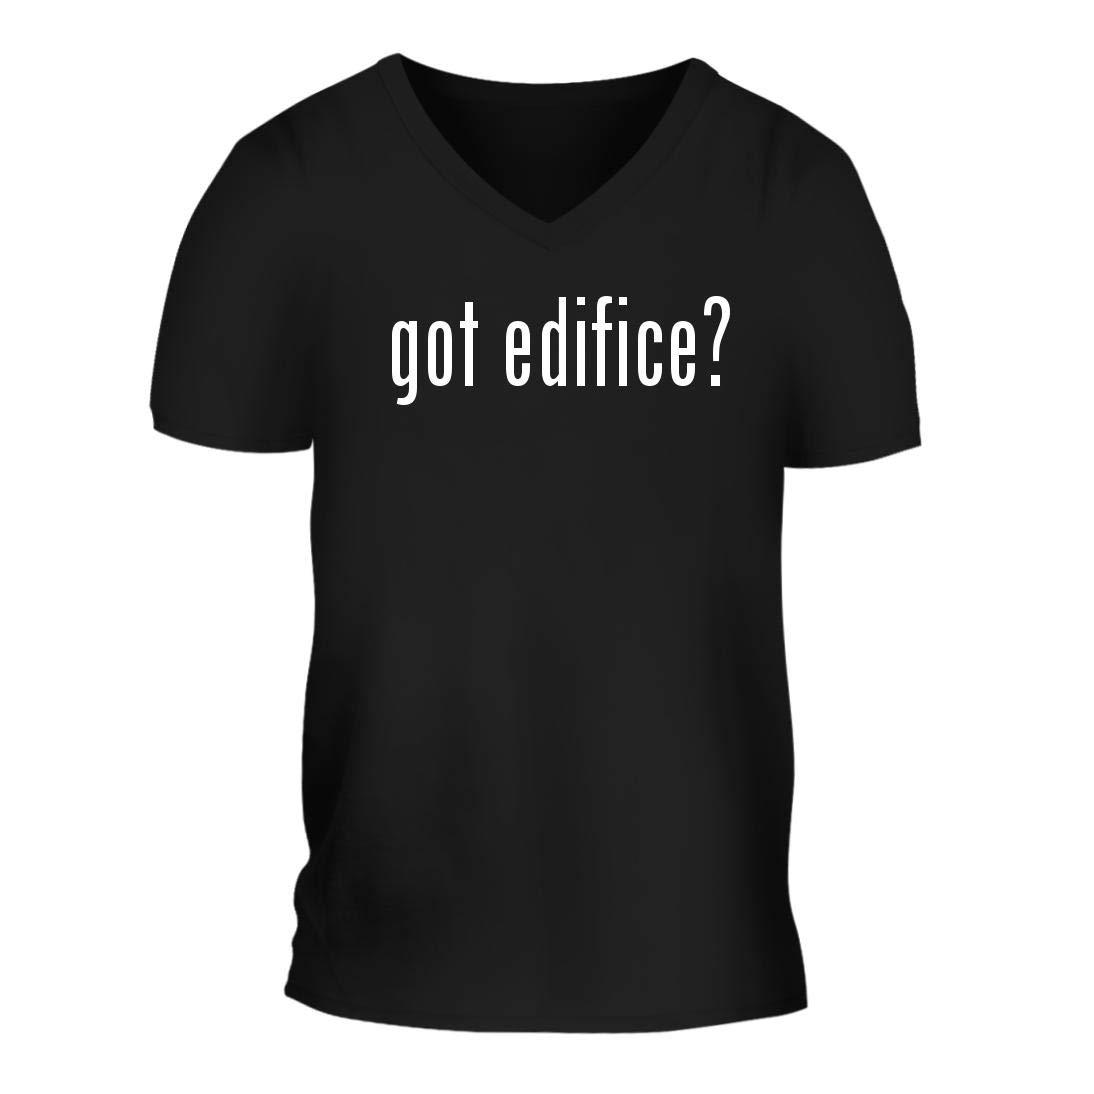 got Edifice? - A Nice Men's Short Sleeve V-Neck T-Shirt Shirt, Black, Large by Shirt Me Up